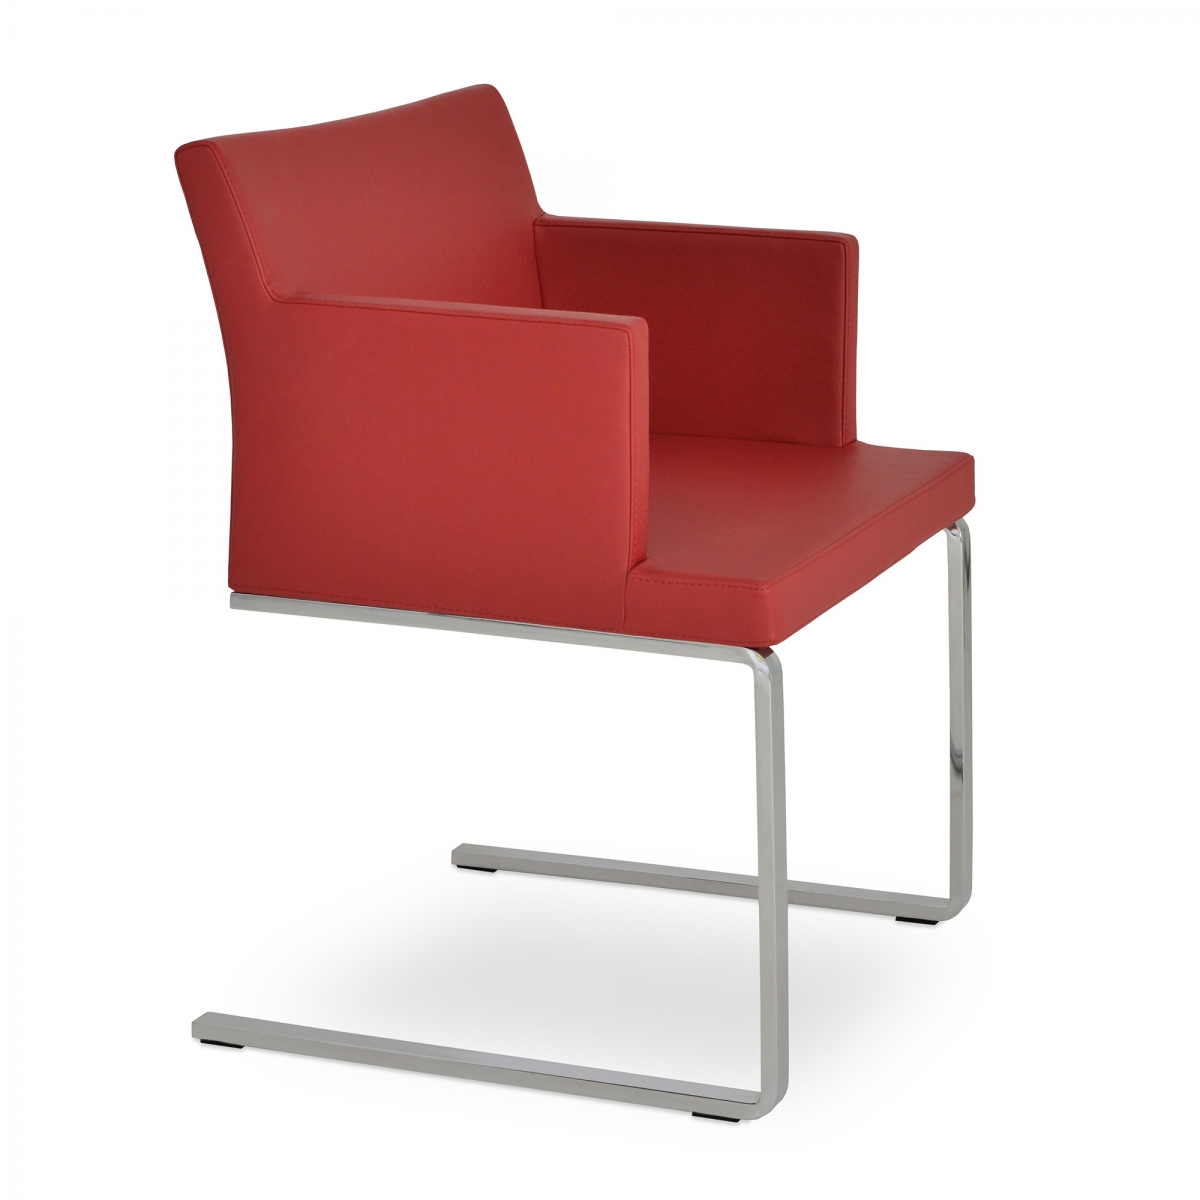 Soho Arm Guest Chair, Flat & Slide Frames